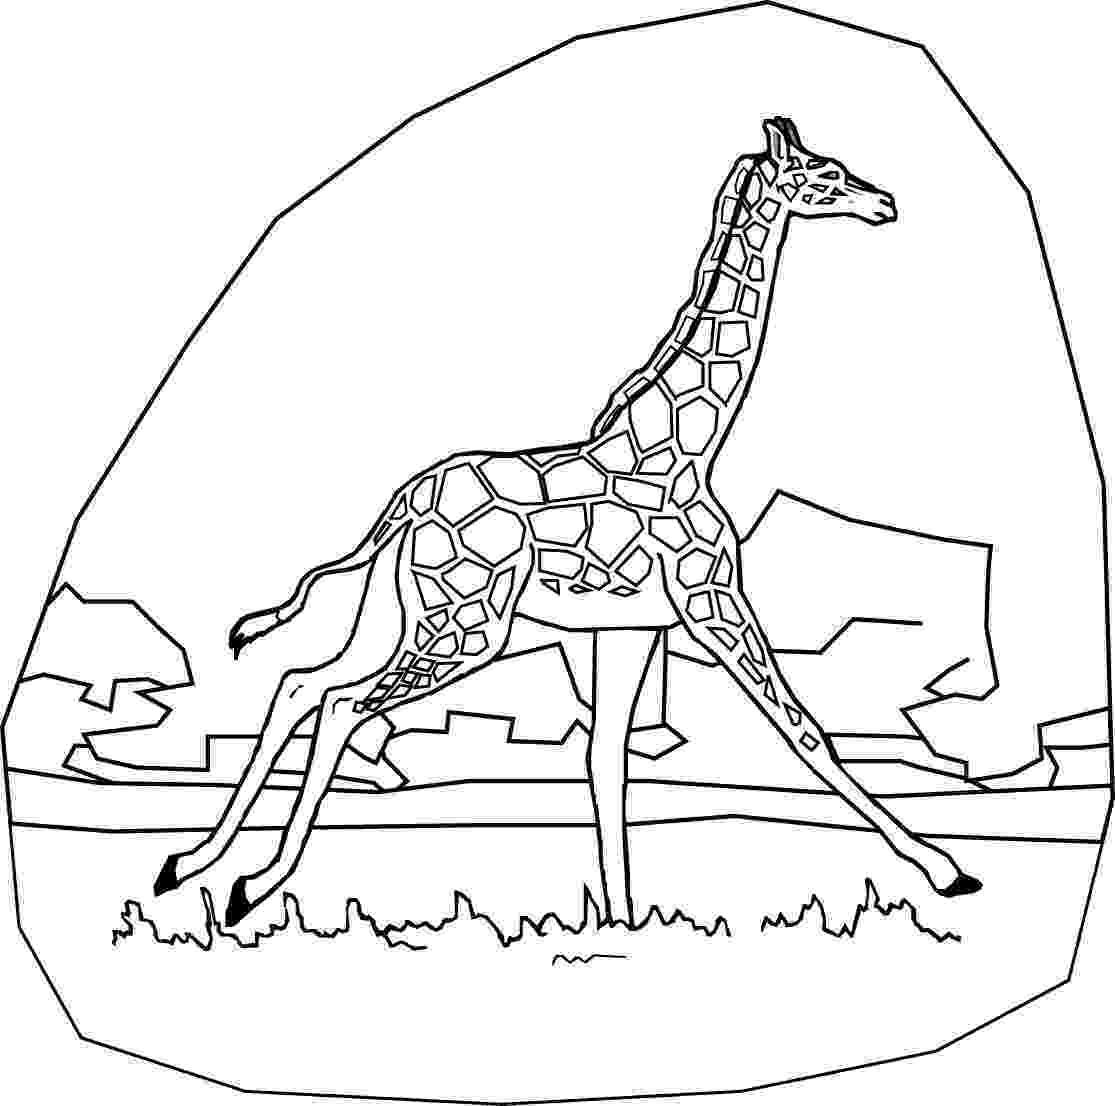 giraffe coloring pages giraffe coloring pages getcoloringpagescom pages coloring giraffe